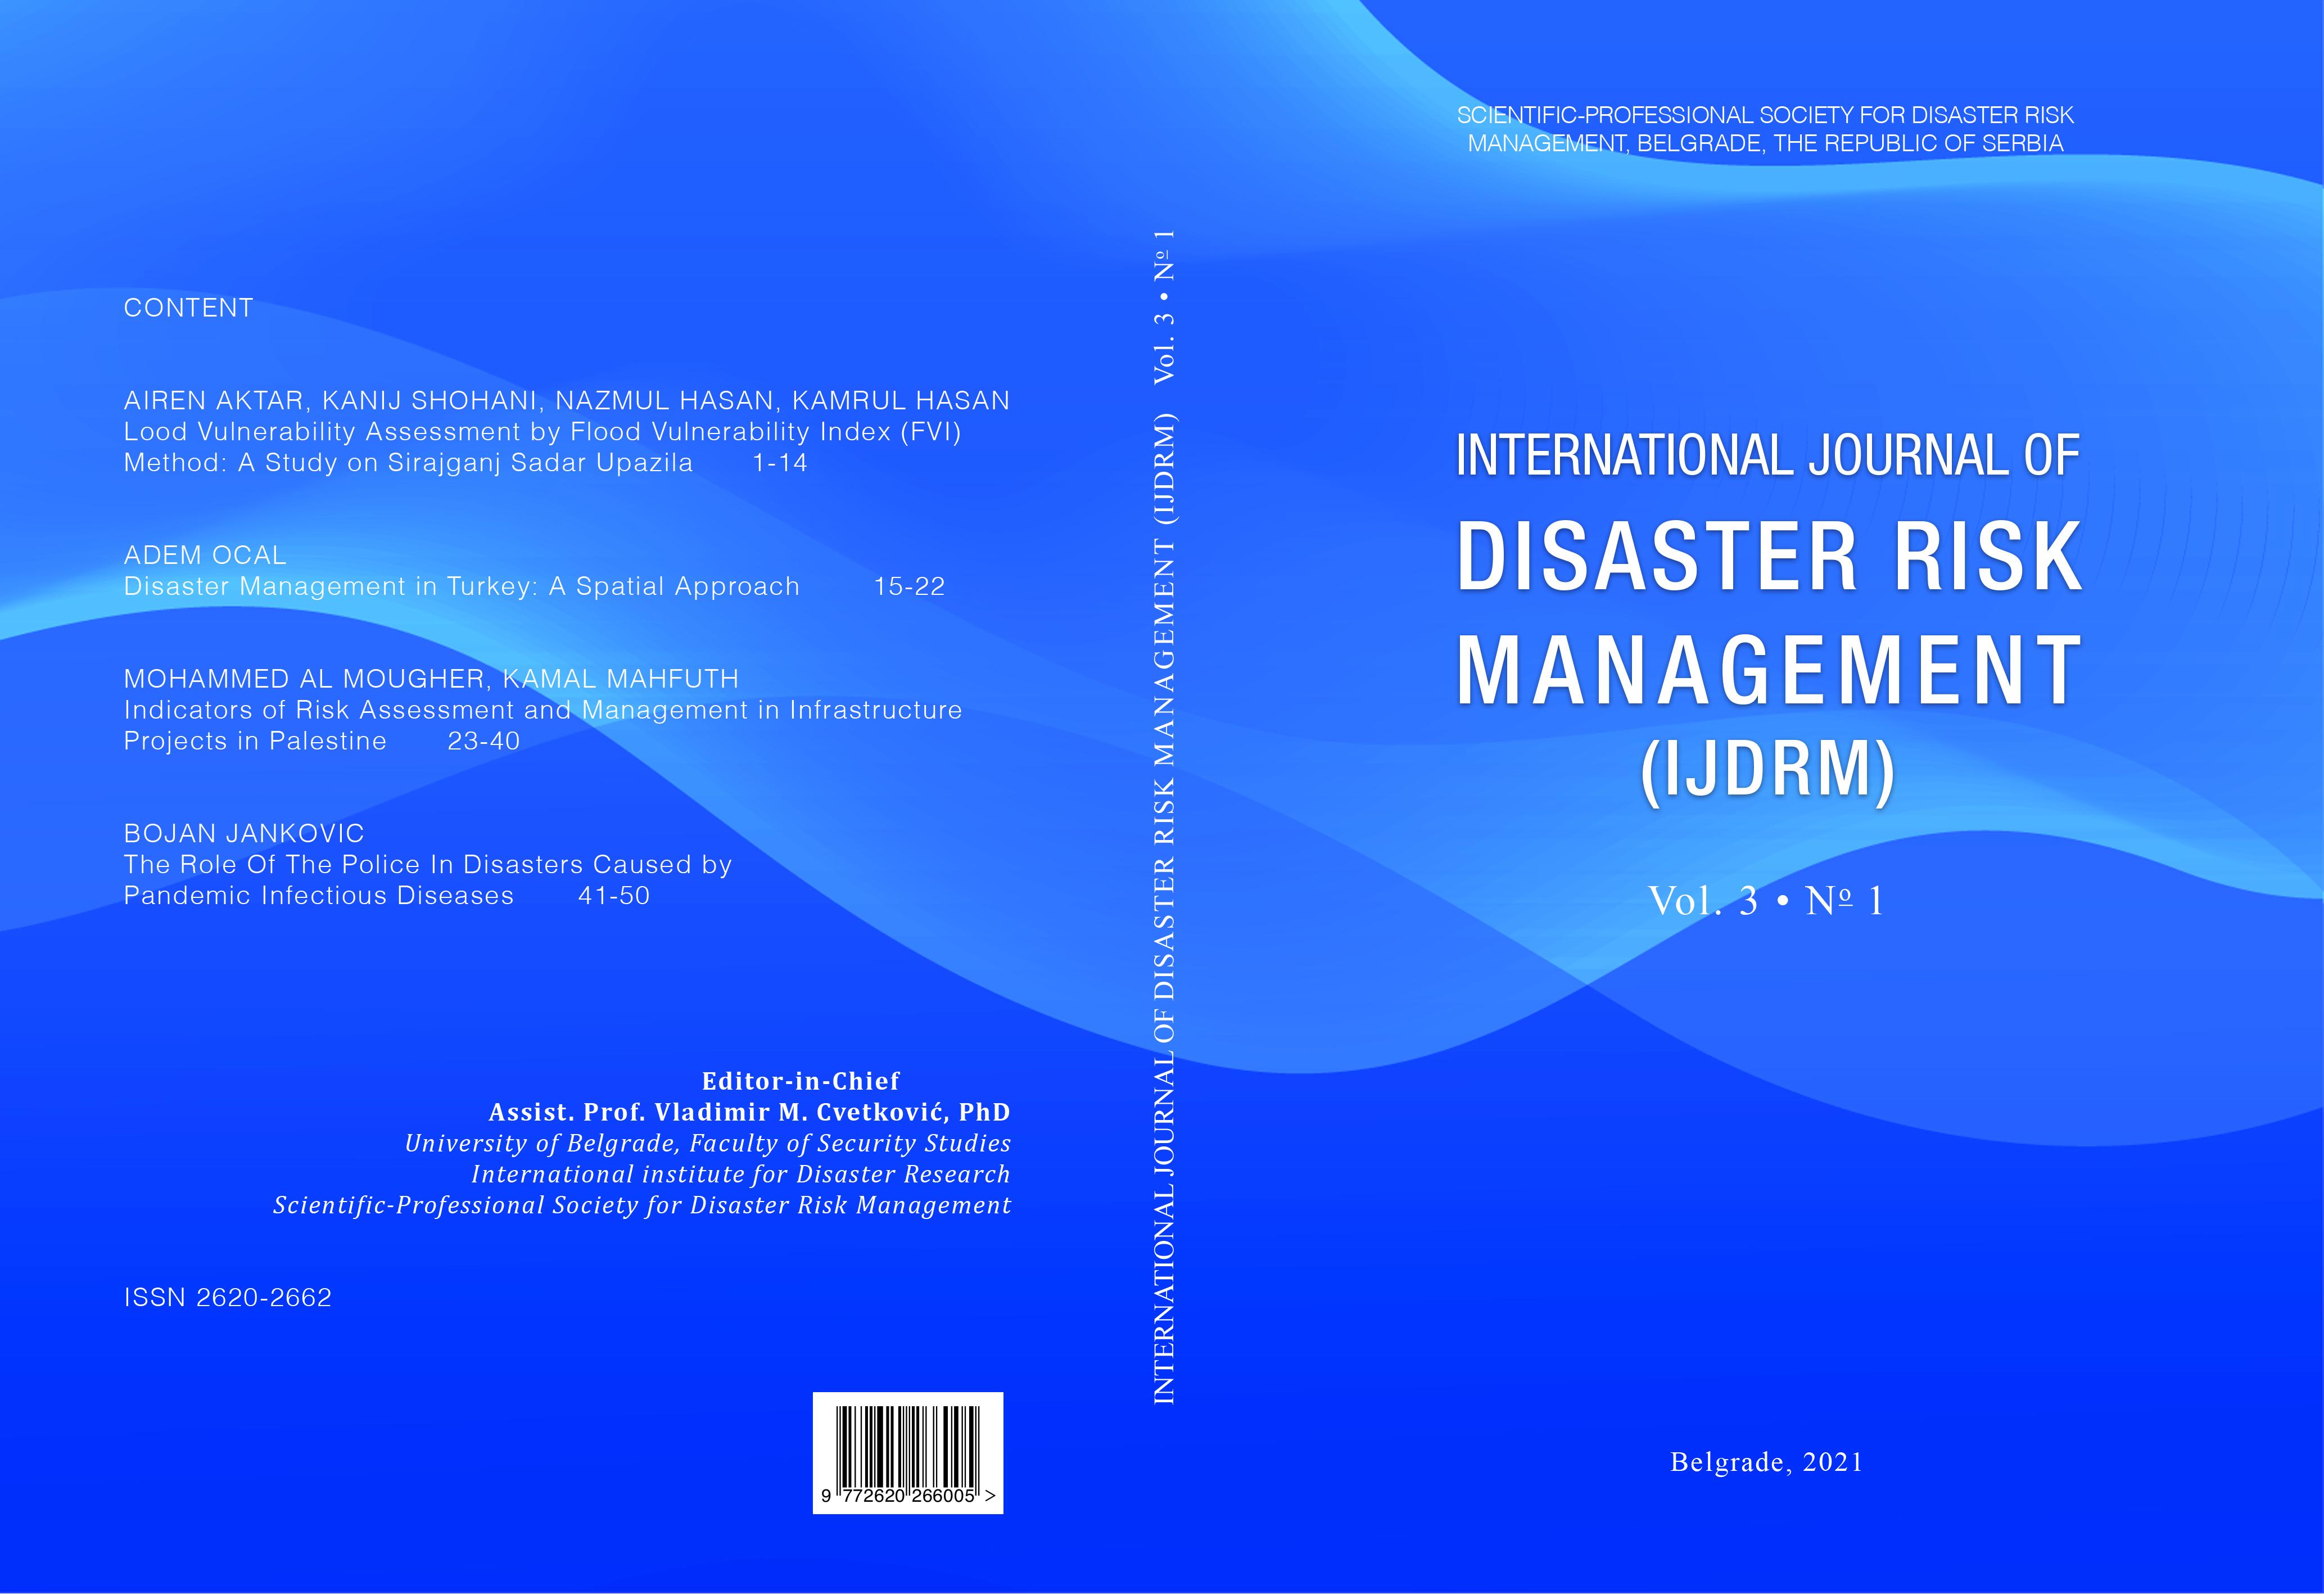 Cover image - International Journal of Disaster Risk Management (IJDRM)